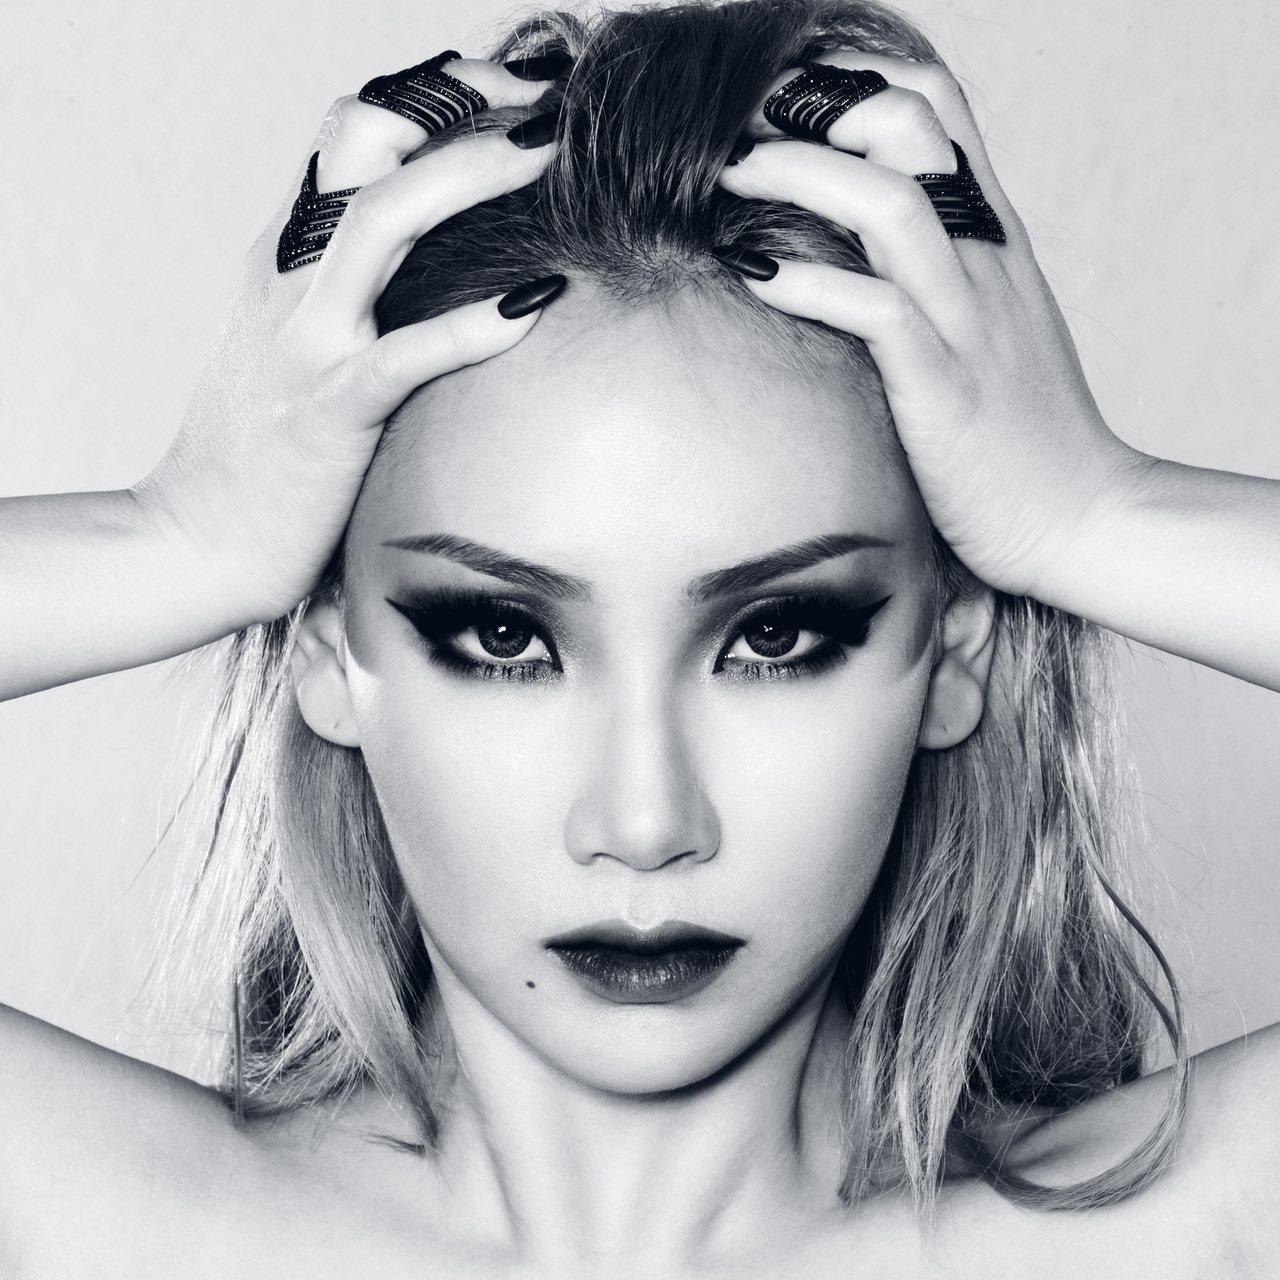 韓國流行天后CL將在「ASIA FASHION AWARD in Taipei」...